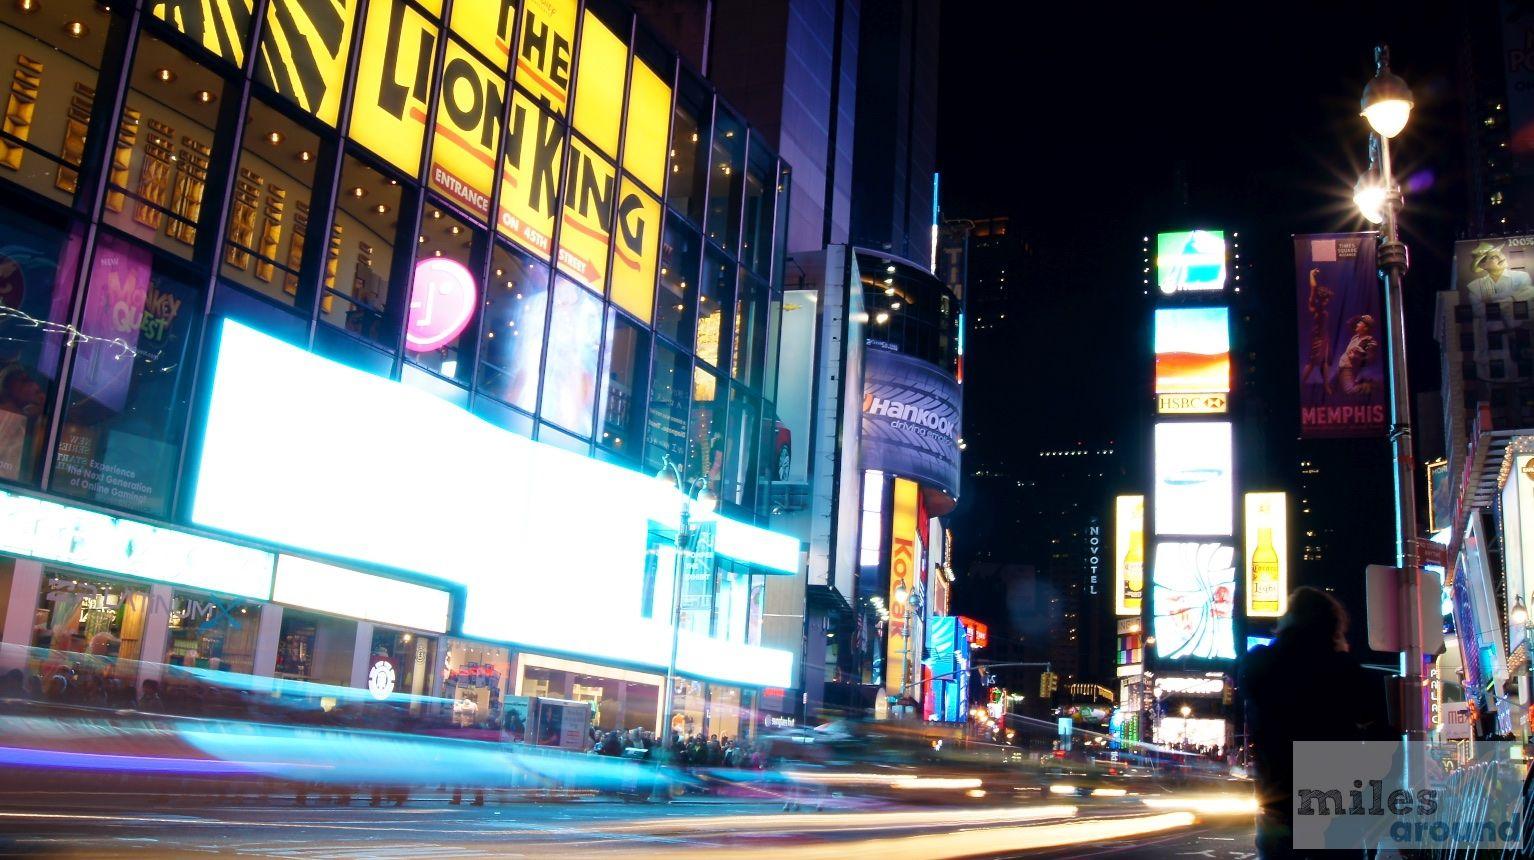 - Check more at https://www.miles-around.de/nordamerika/usa/new-york/nyc-times-square-bei-nacht/,  #NewYork #NewYorkCity #Reisebericht #TimesSquare #USA